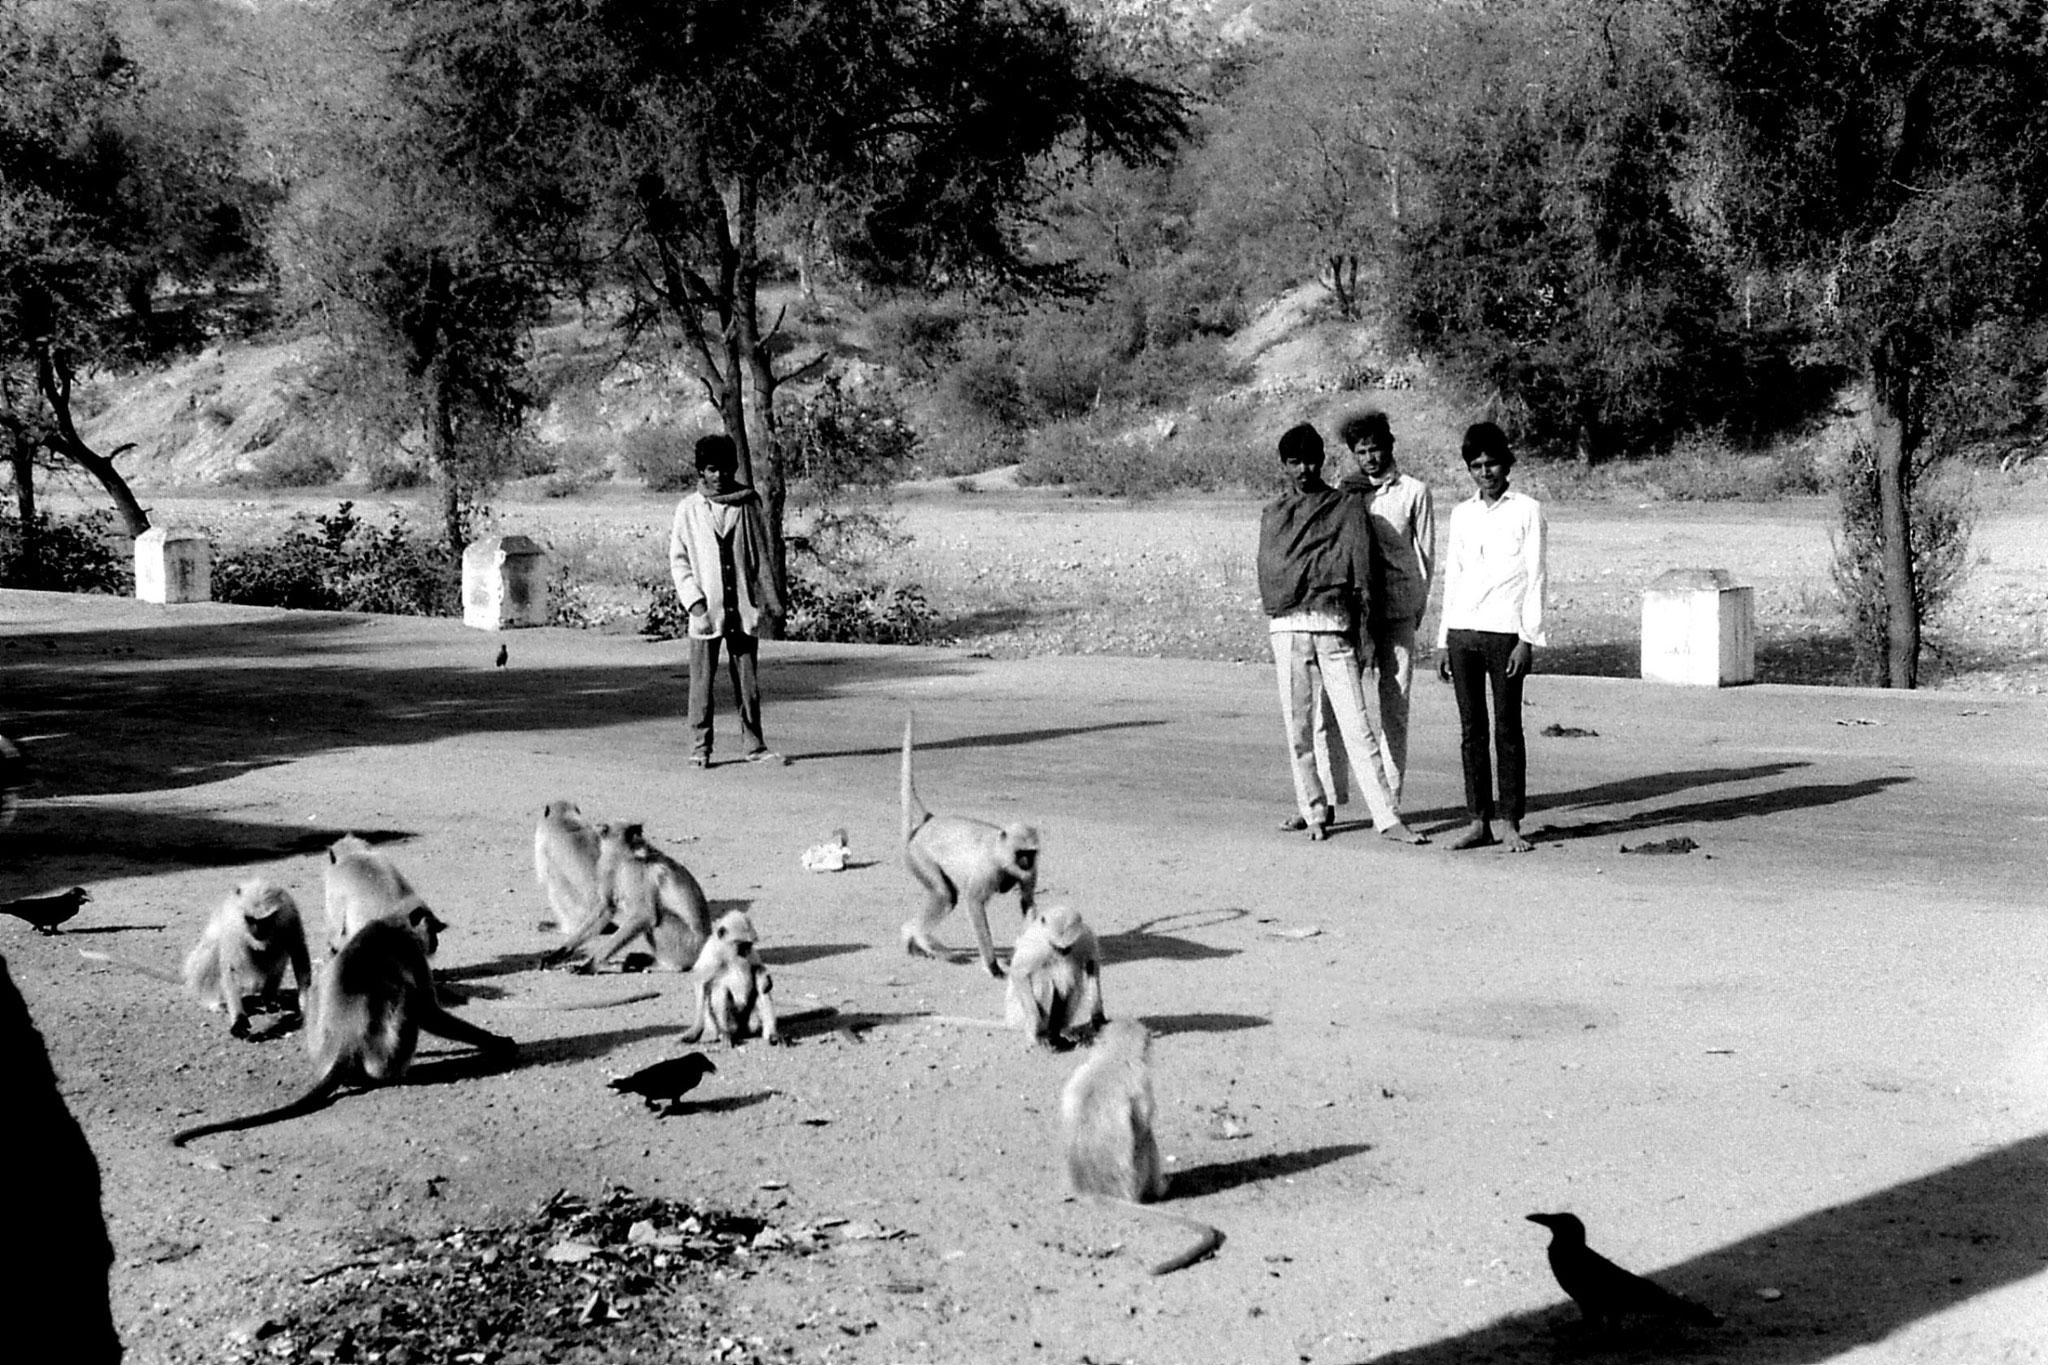 7/12/1989: 11: monkeys at bus stop